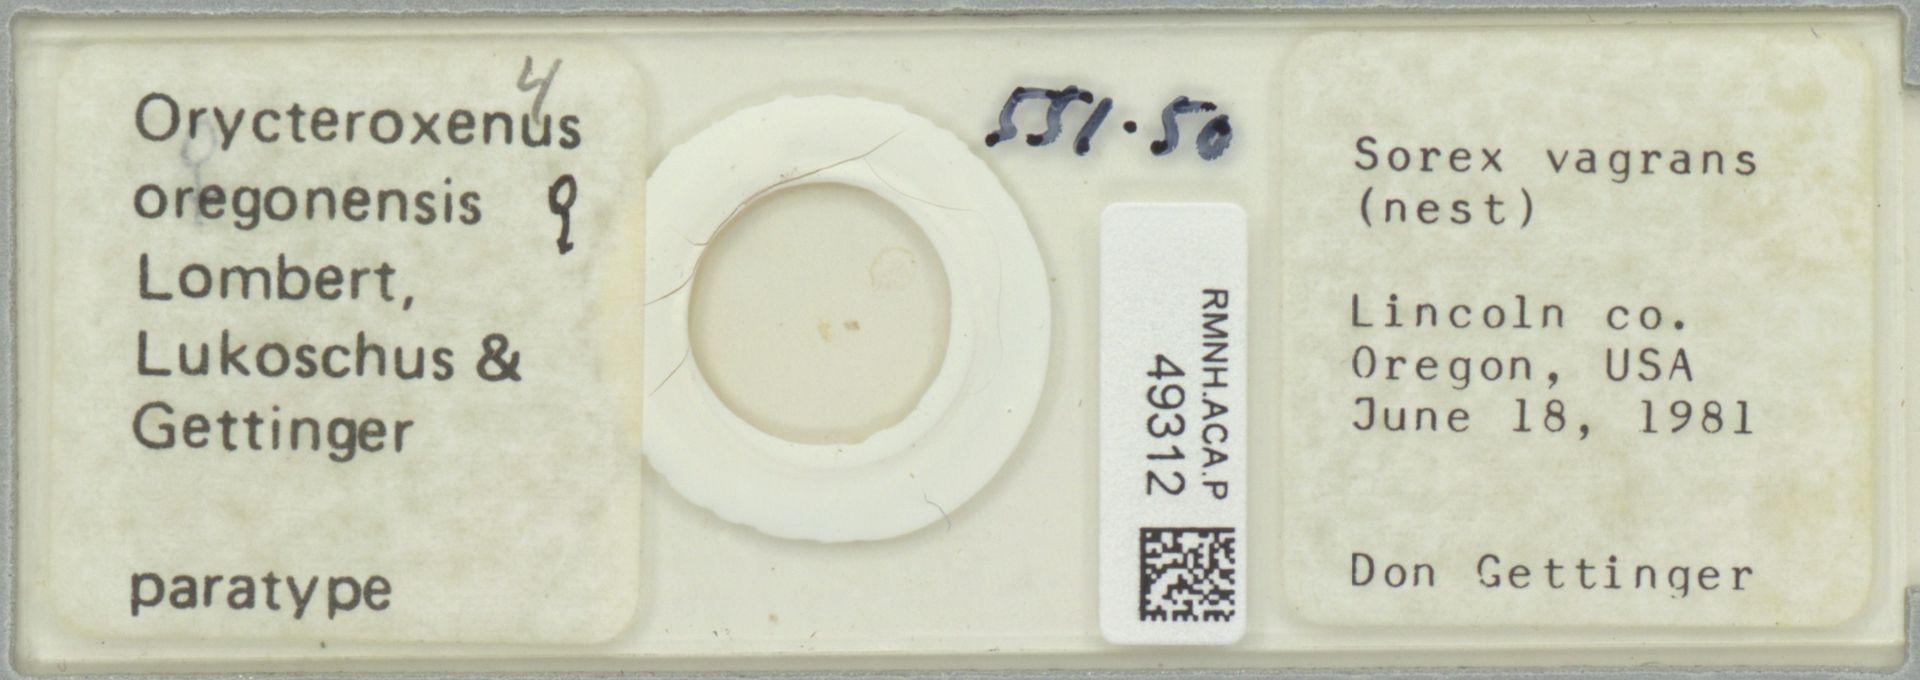 RMNH.ACA.P.49312 | Orycteroxenus oregonensis Lombert, Lukoschus & Gettinger